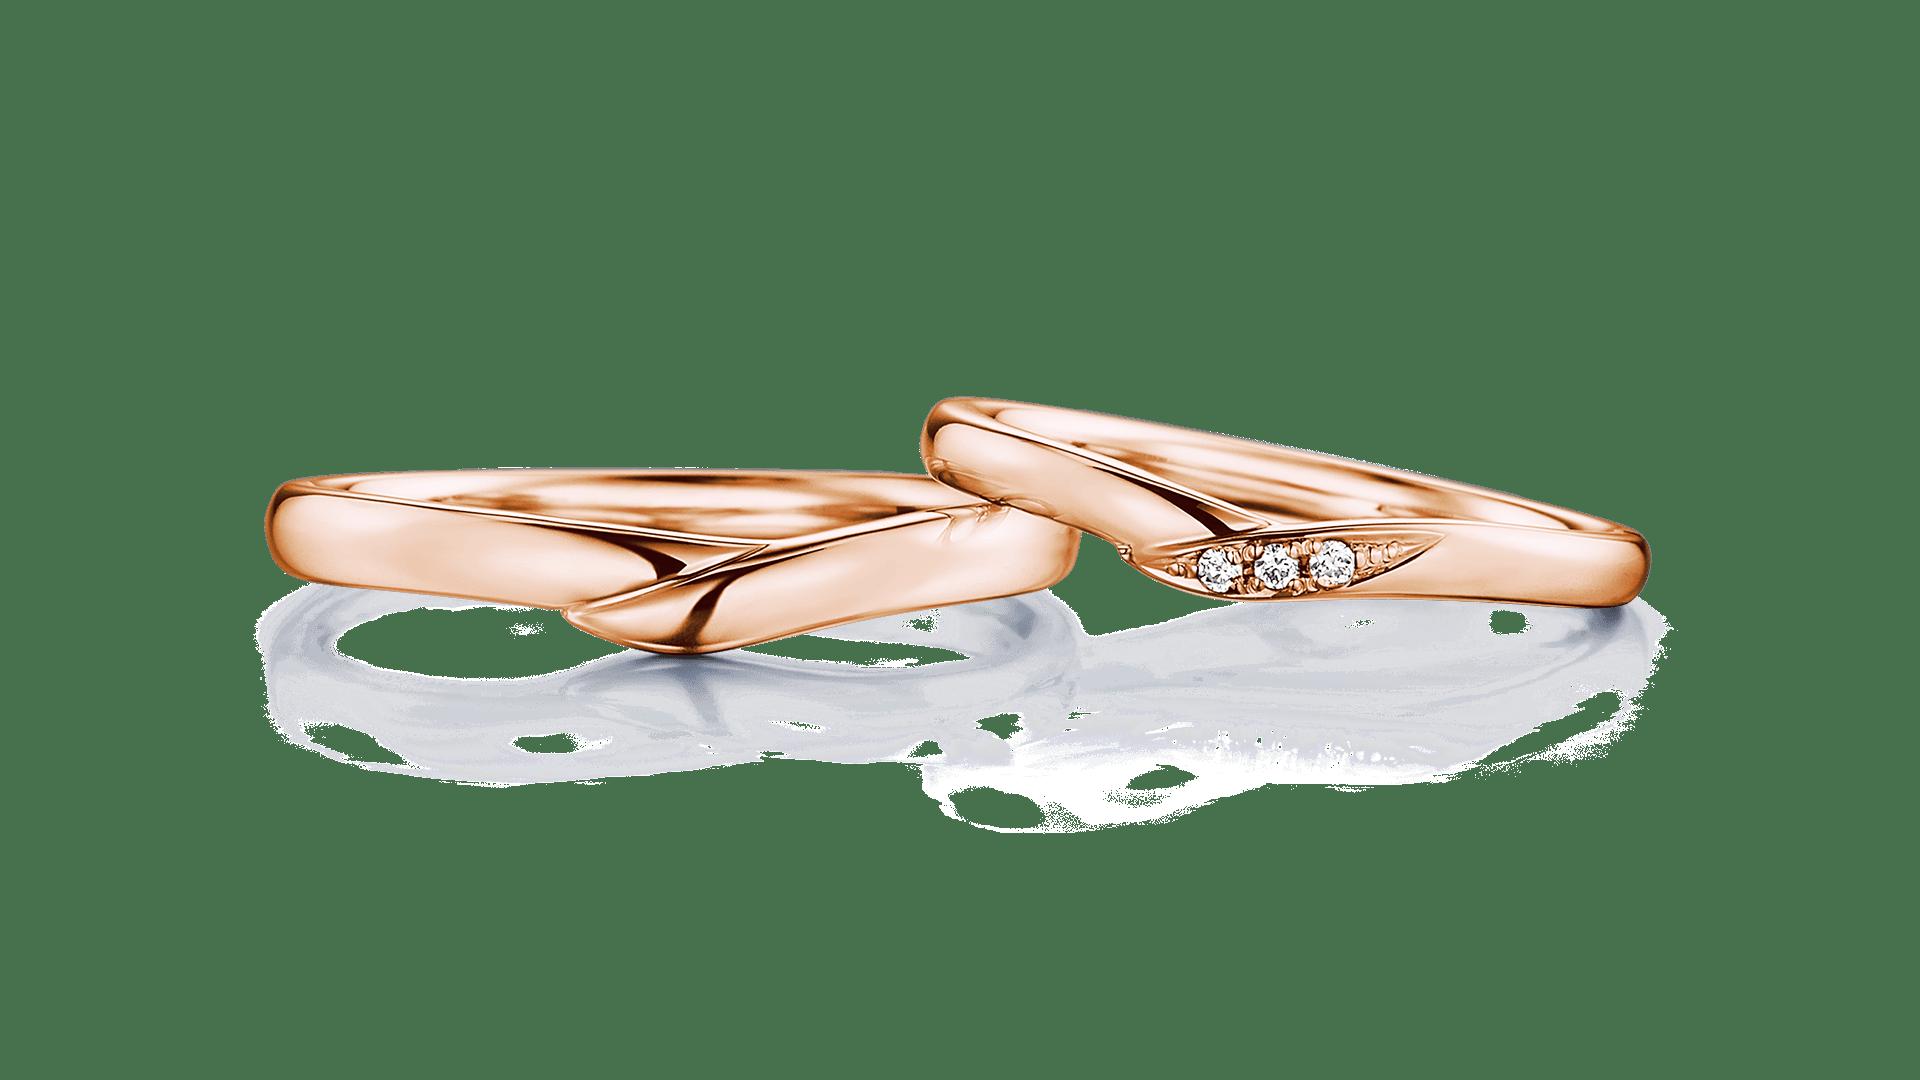 clementia クレメンティア | 結婚指輪サムネイル 1